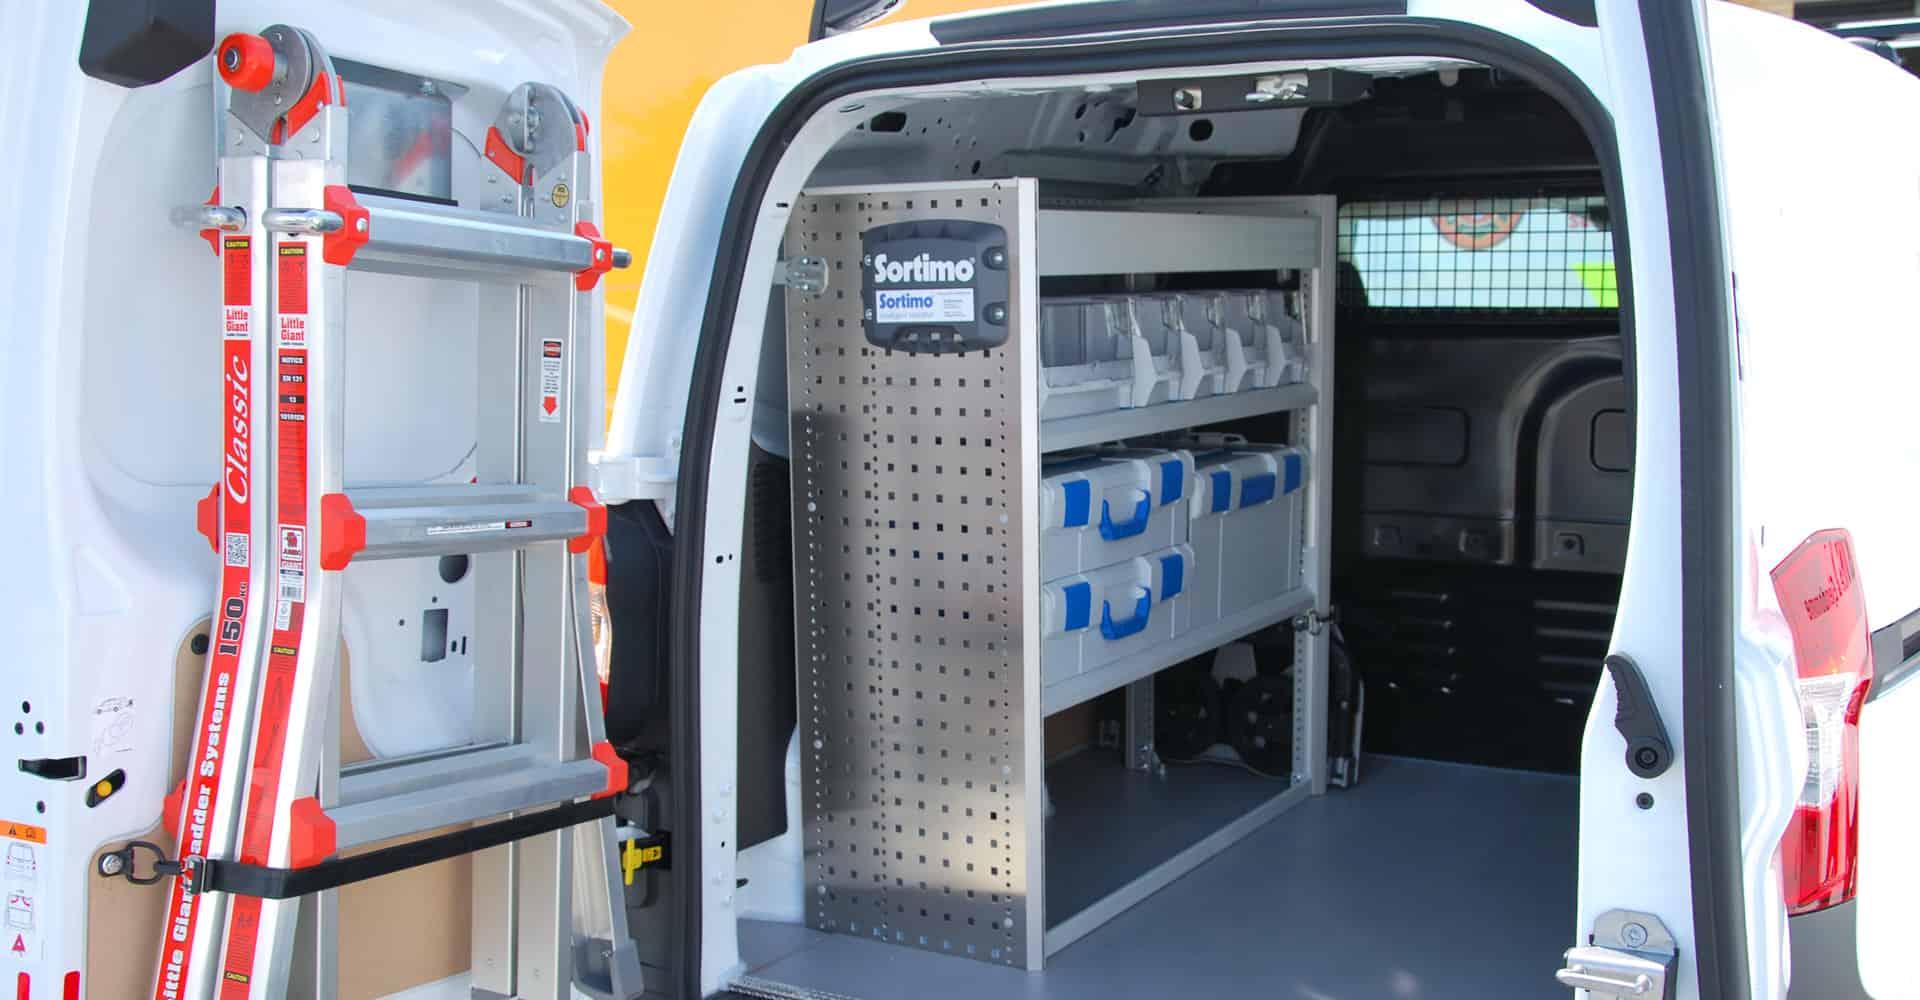 alsbilindretning bagdør minivan med stige